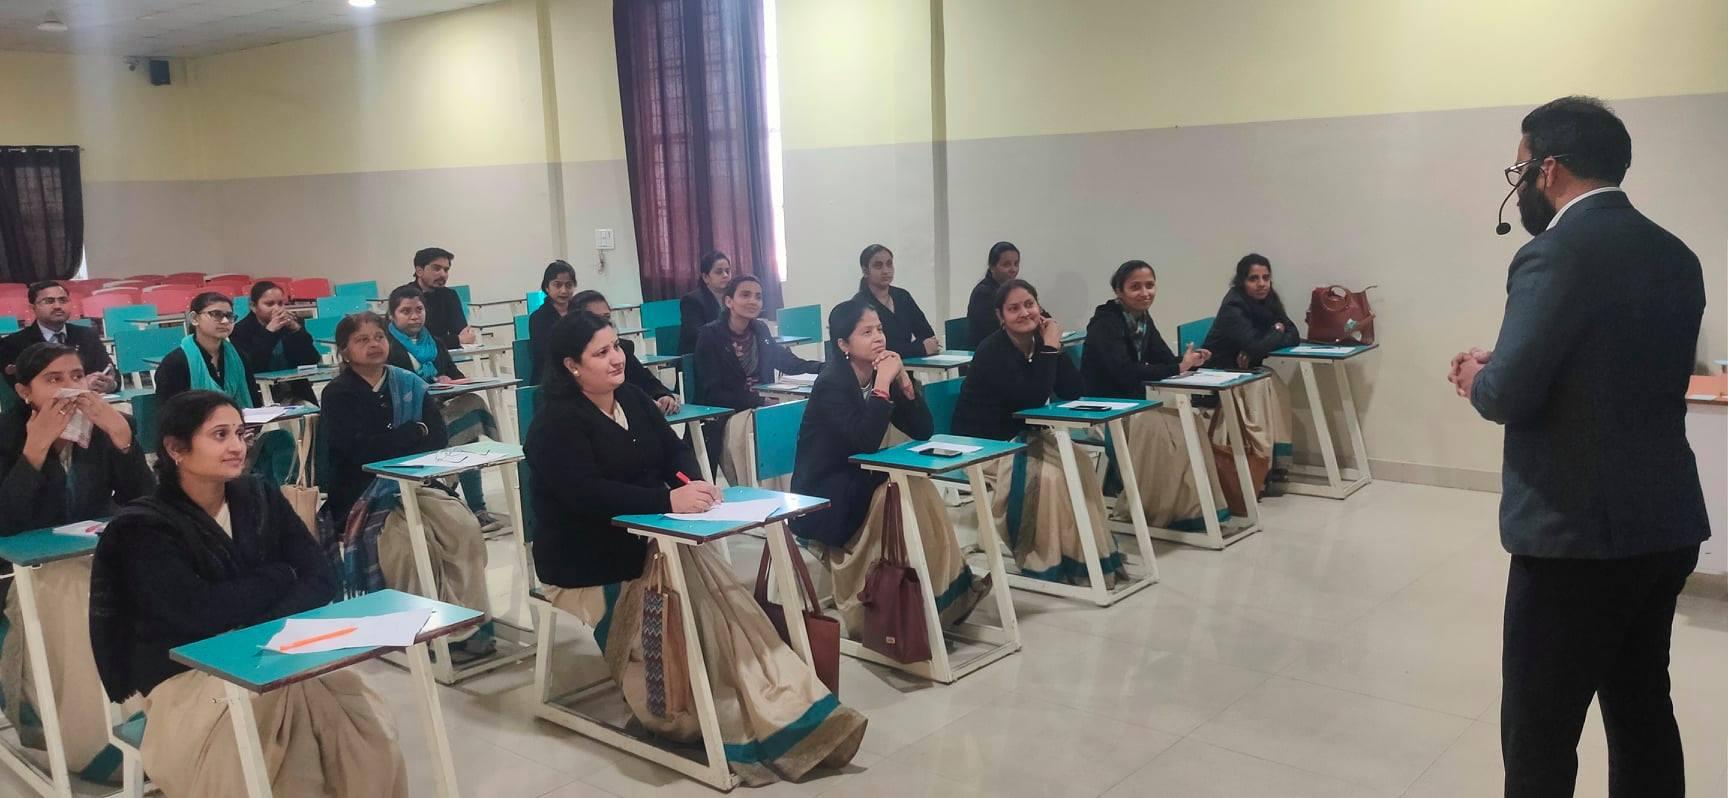 Teachers training workshop am world school